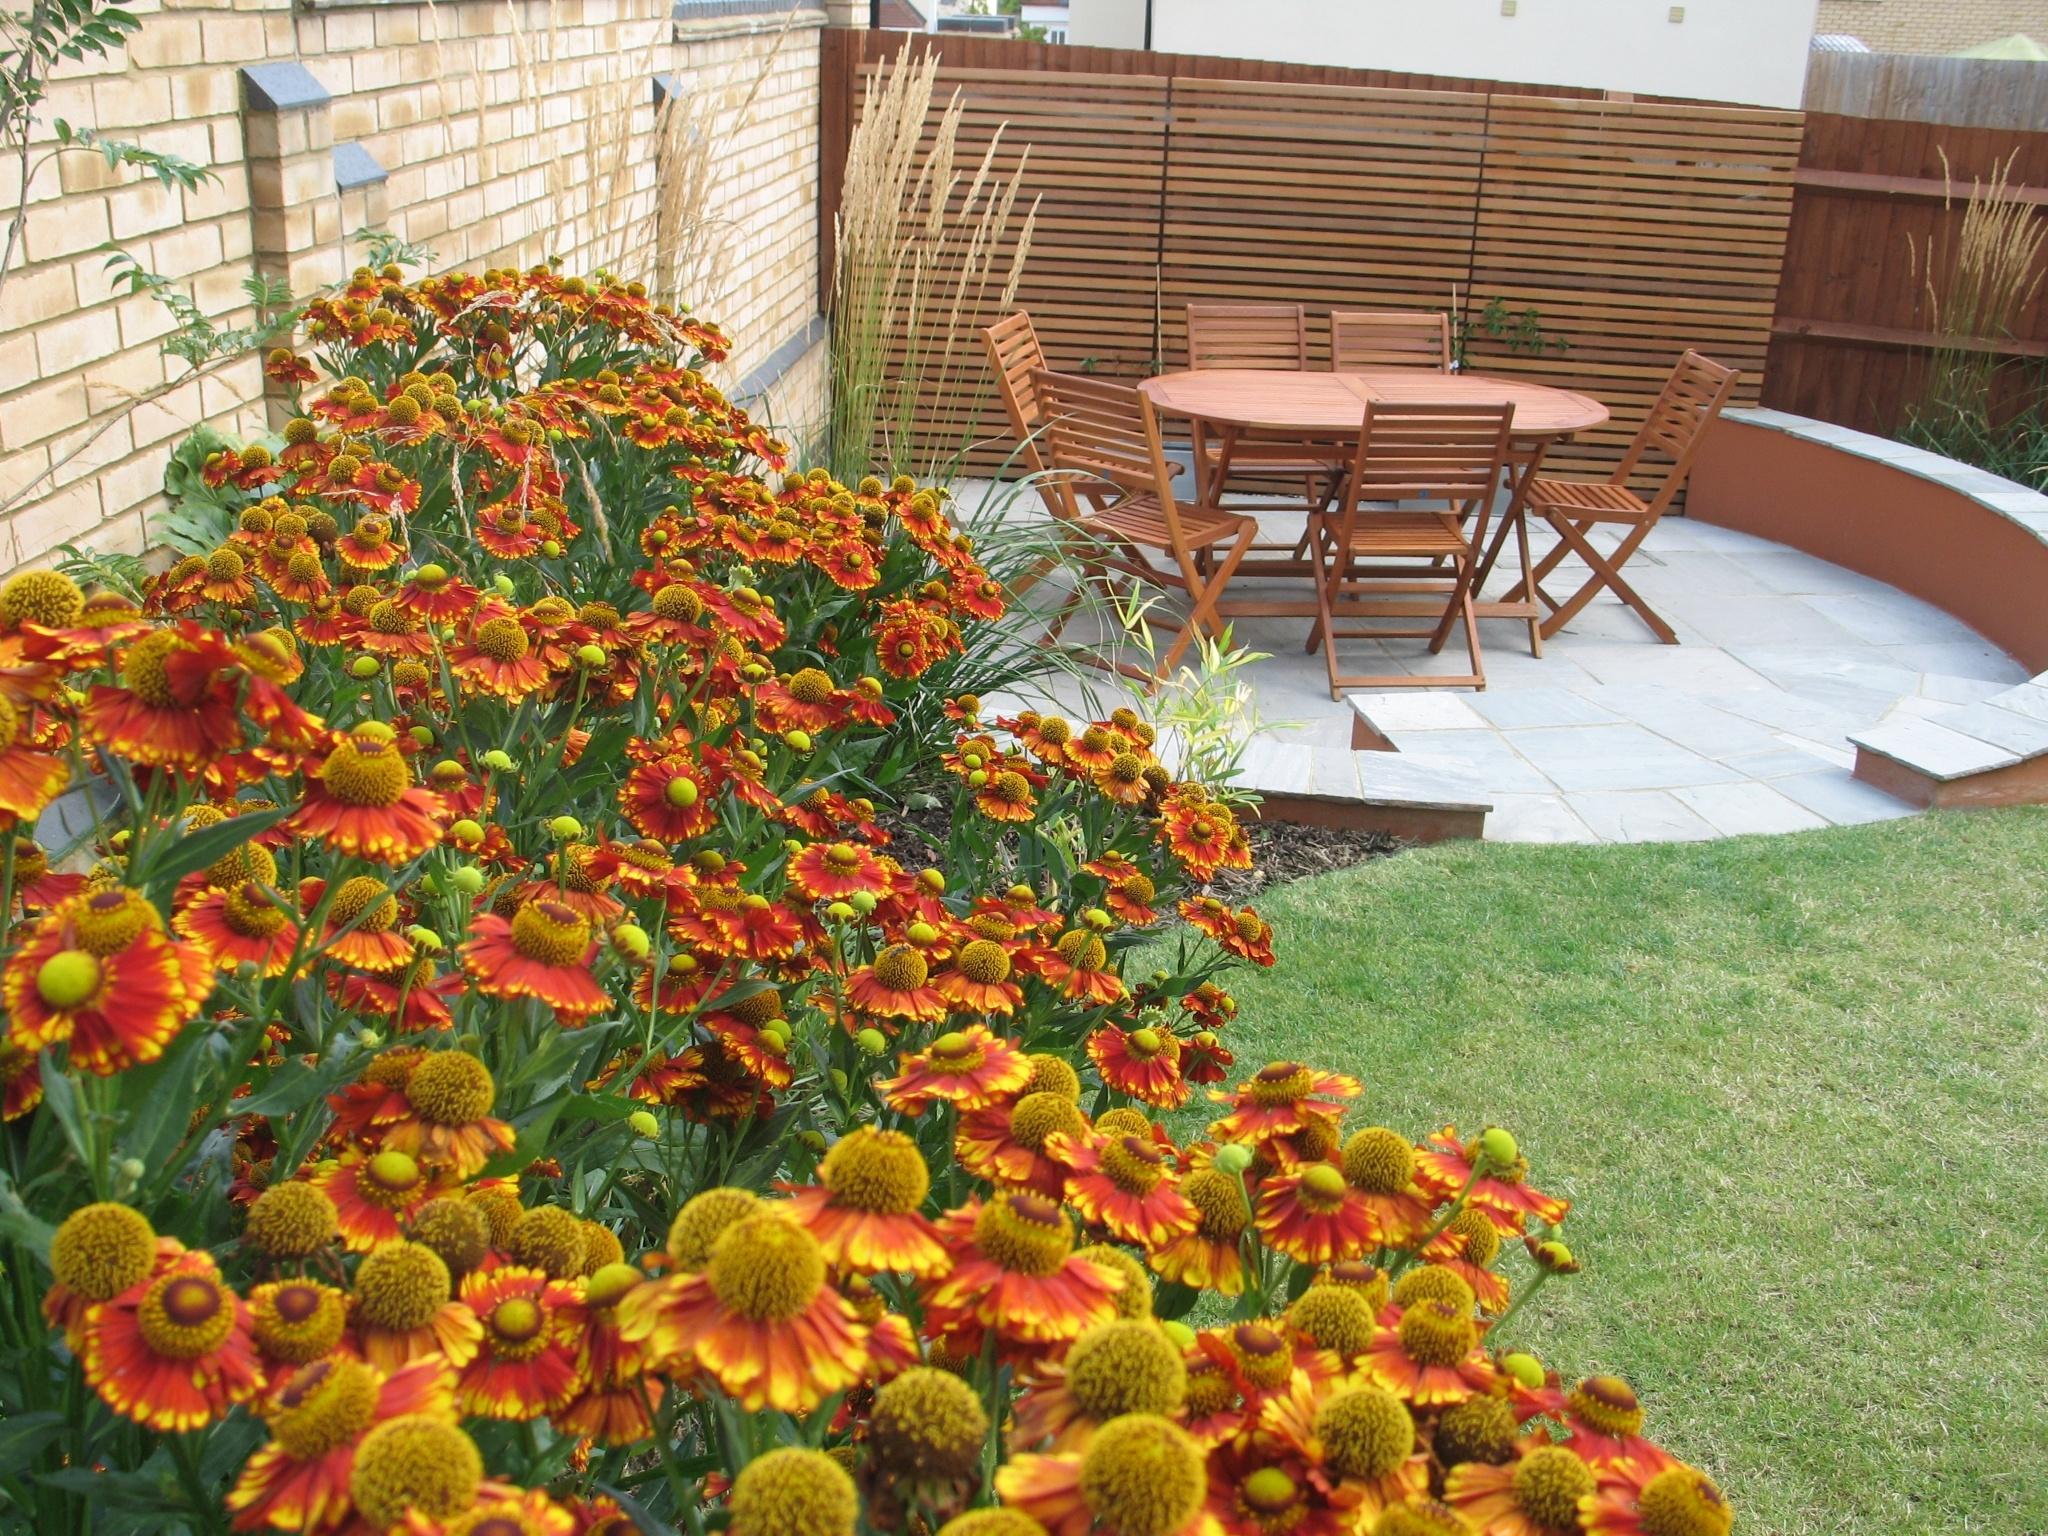 Garden_Design-860907-edited.jpg